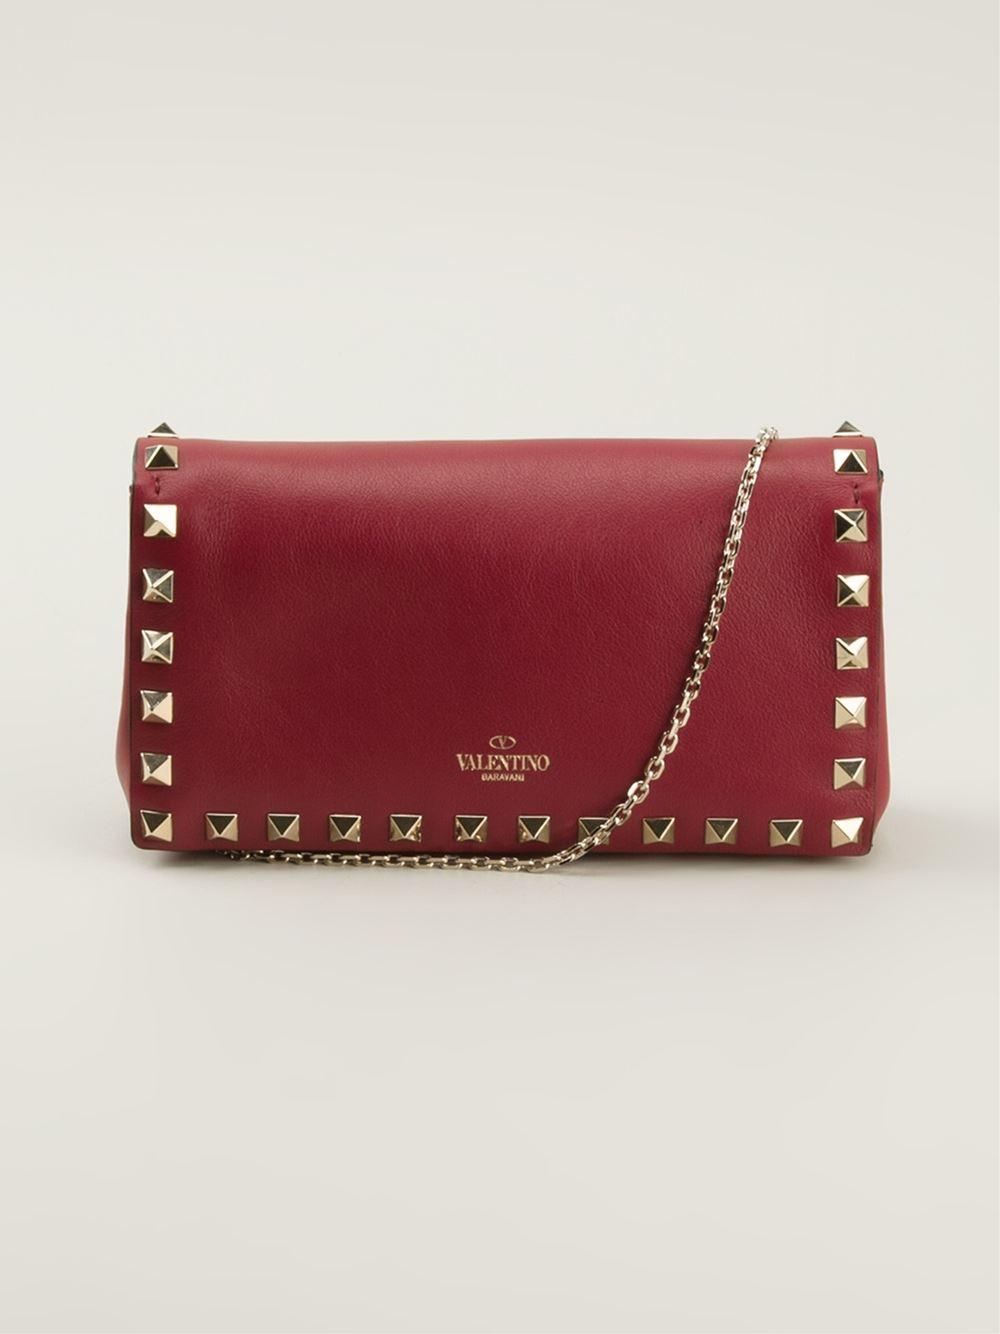 lyst valentino mini rockstud chain shoulder bag in red. Black Bedroom Furniture Sets. Home Design Ideas